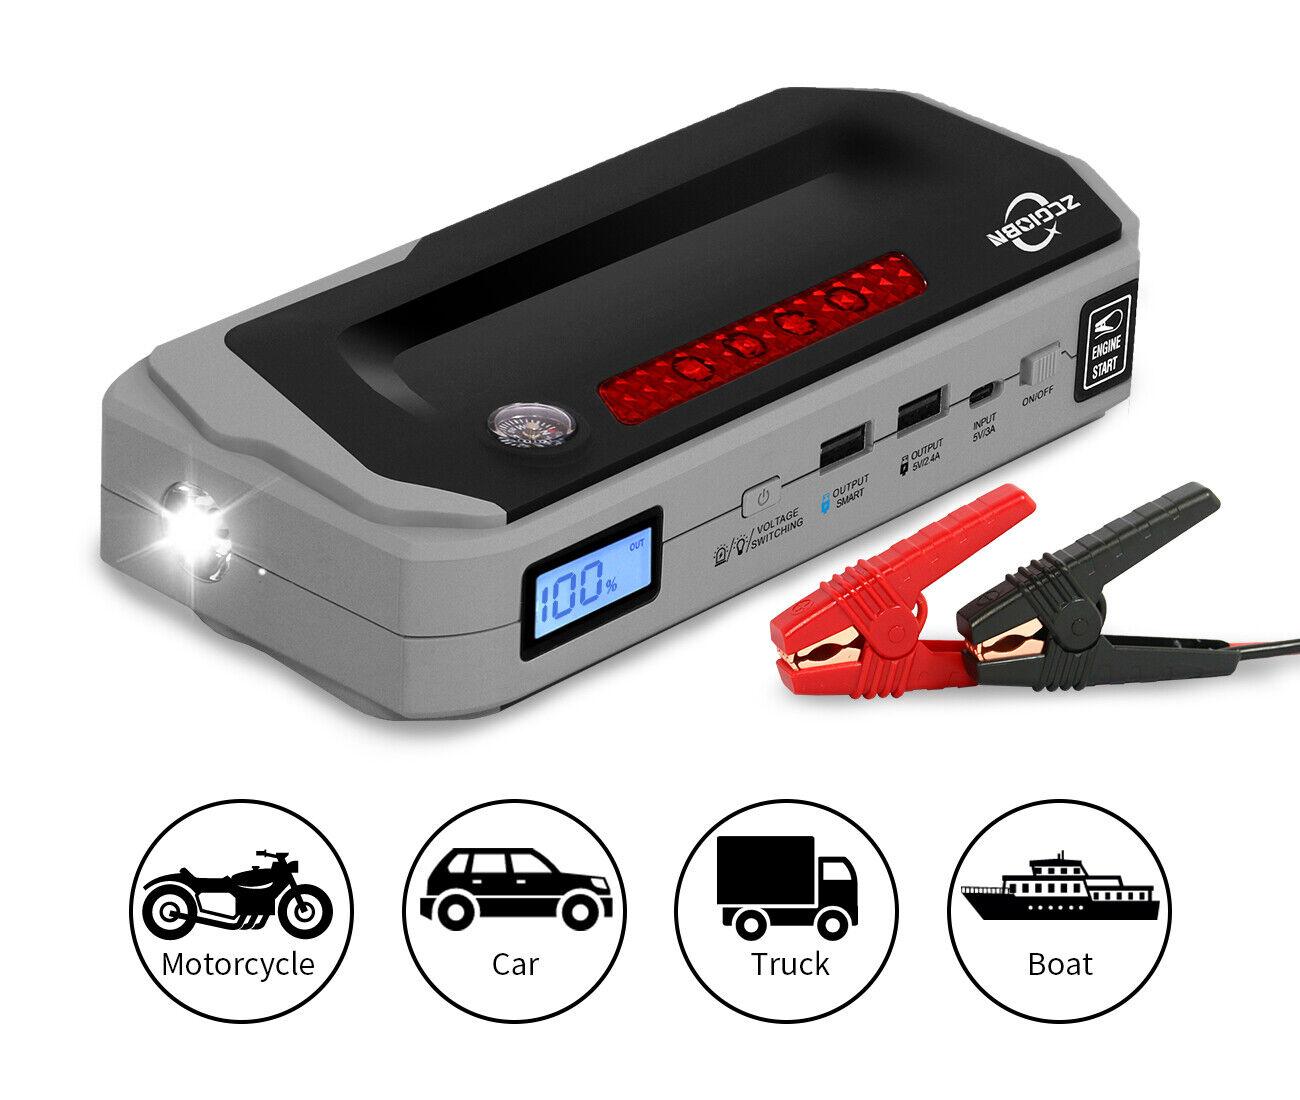 20800mAh Powerful Car Jump Starter (up to 8L Gas/6.0L Diesel) QDSP 2 USB Outputs